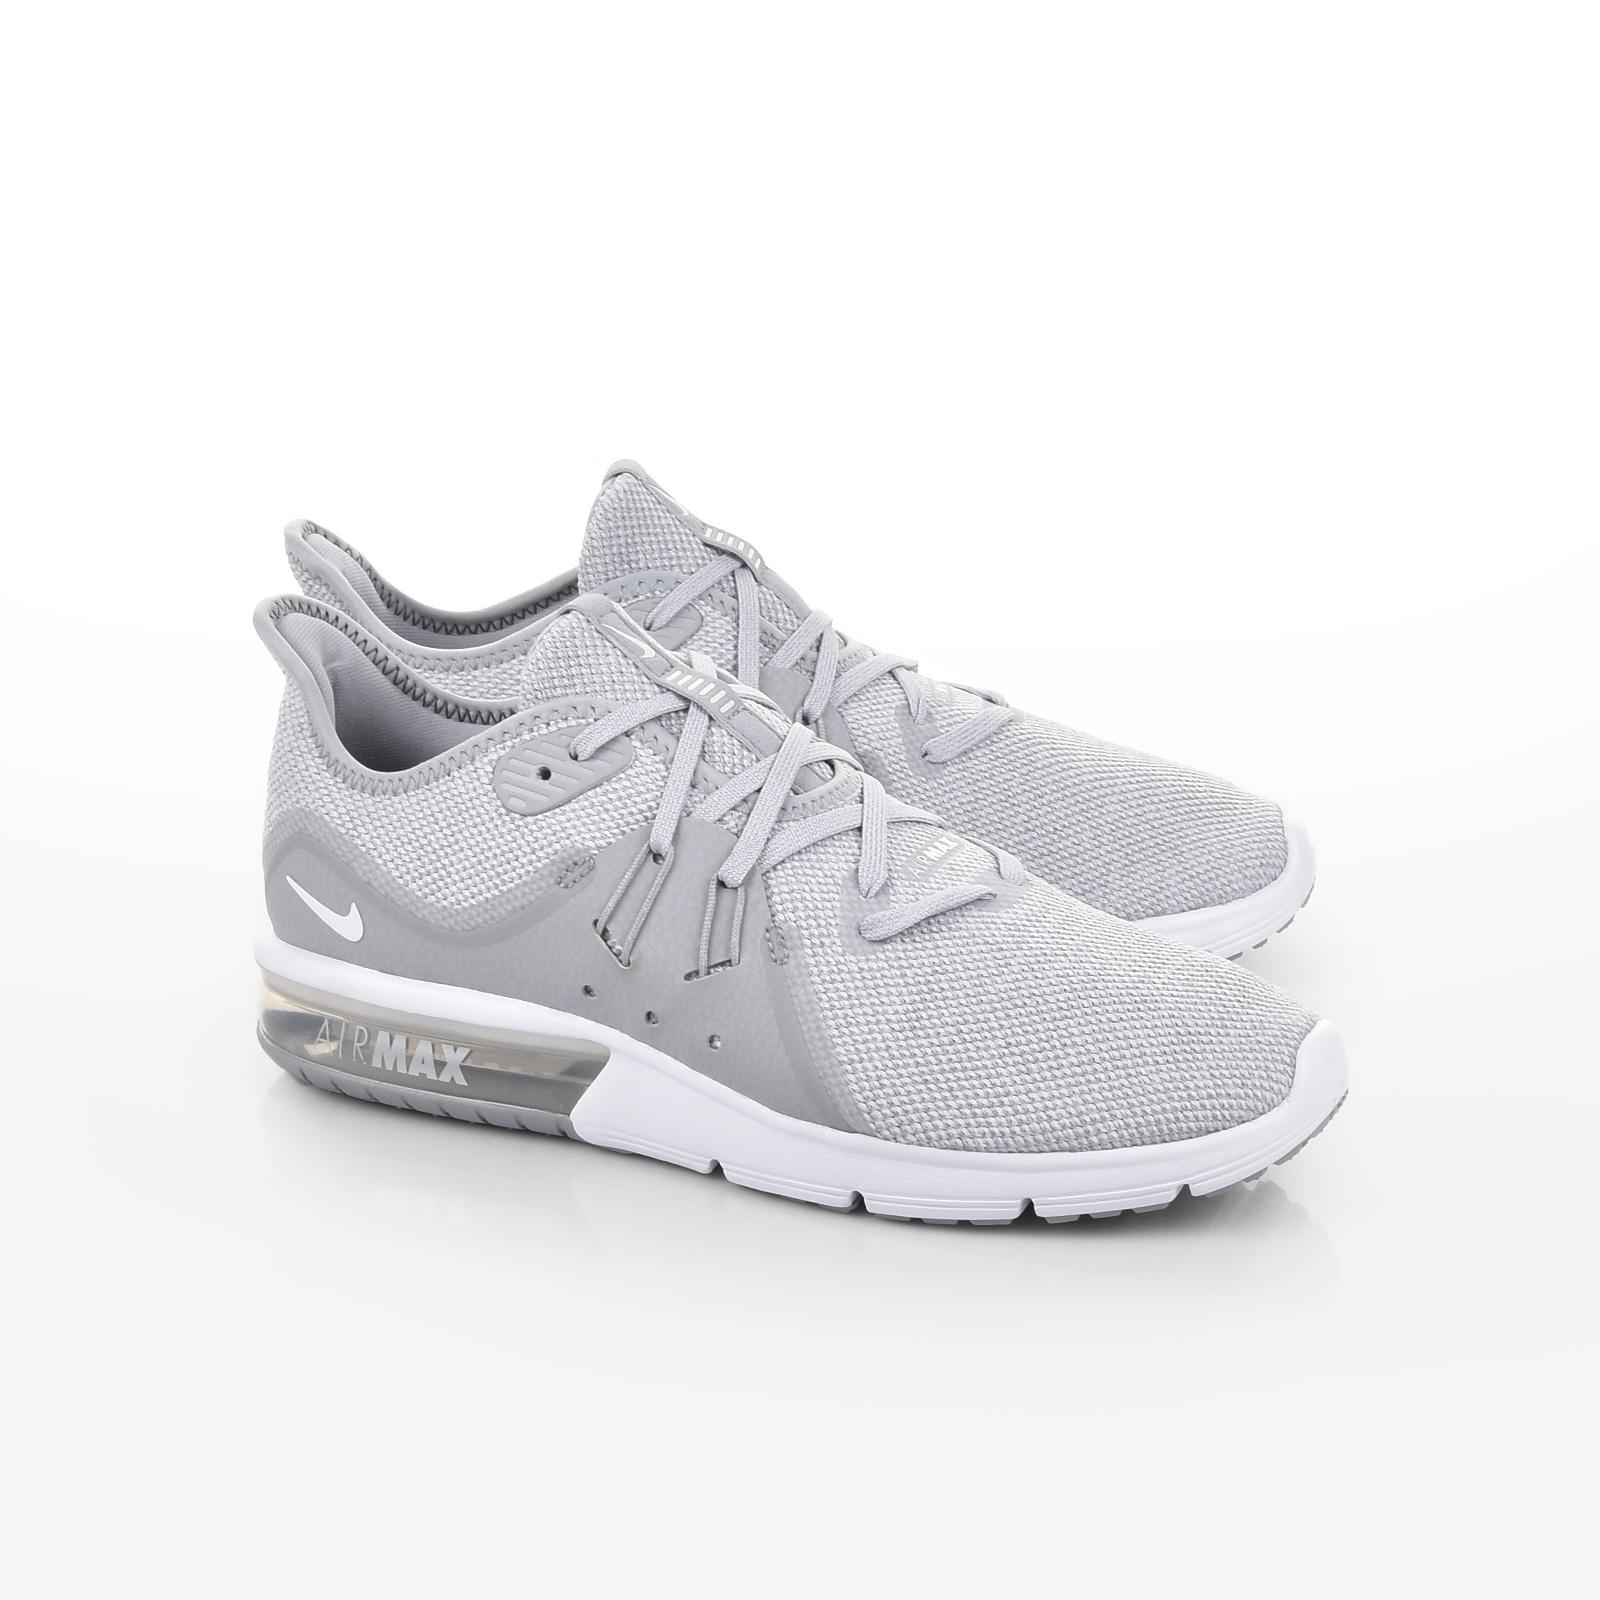 1aab9df769e Nike - NIKE AIR MAX SEQUENT 3 - WOLF GREY/WHITE-, ΑΝΔΡΑΣ | ΠΑΠΟΥΤΣΙΑ ...